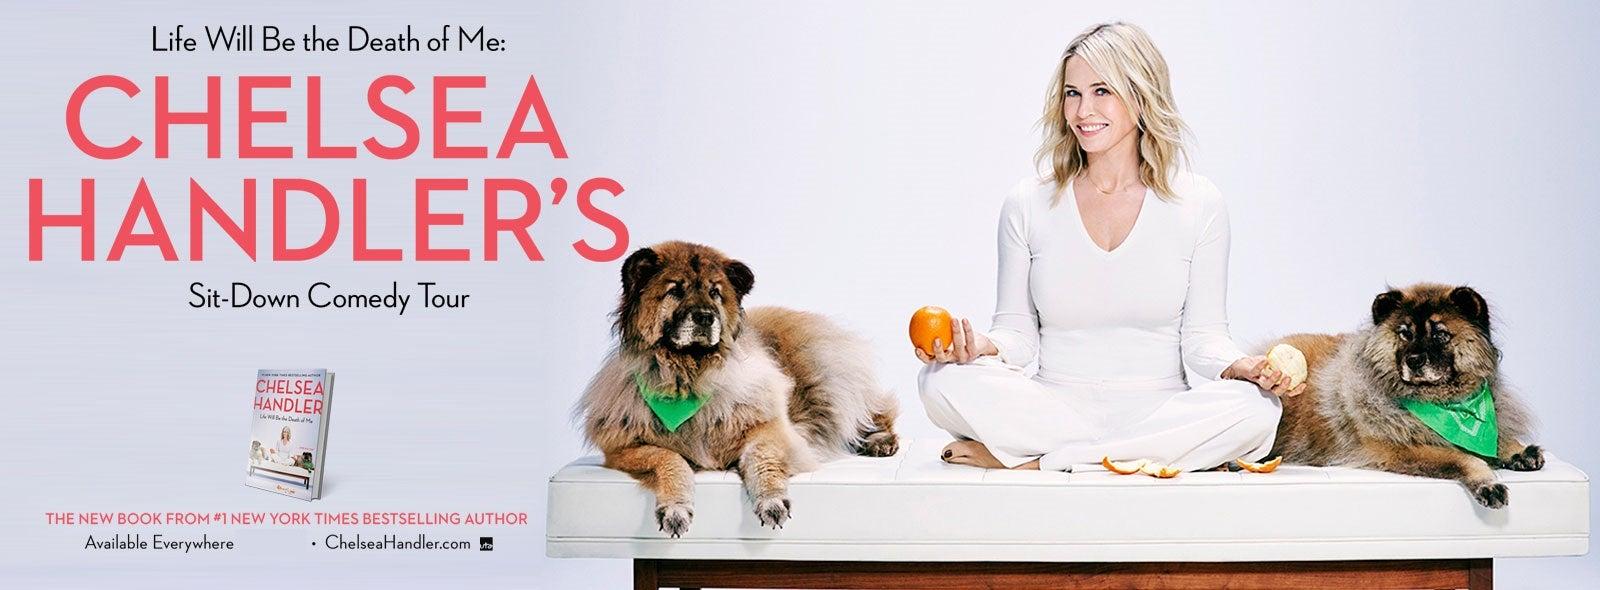 Chelsea Handler's Sit-Down Comedy Tour